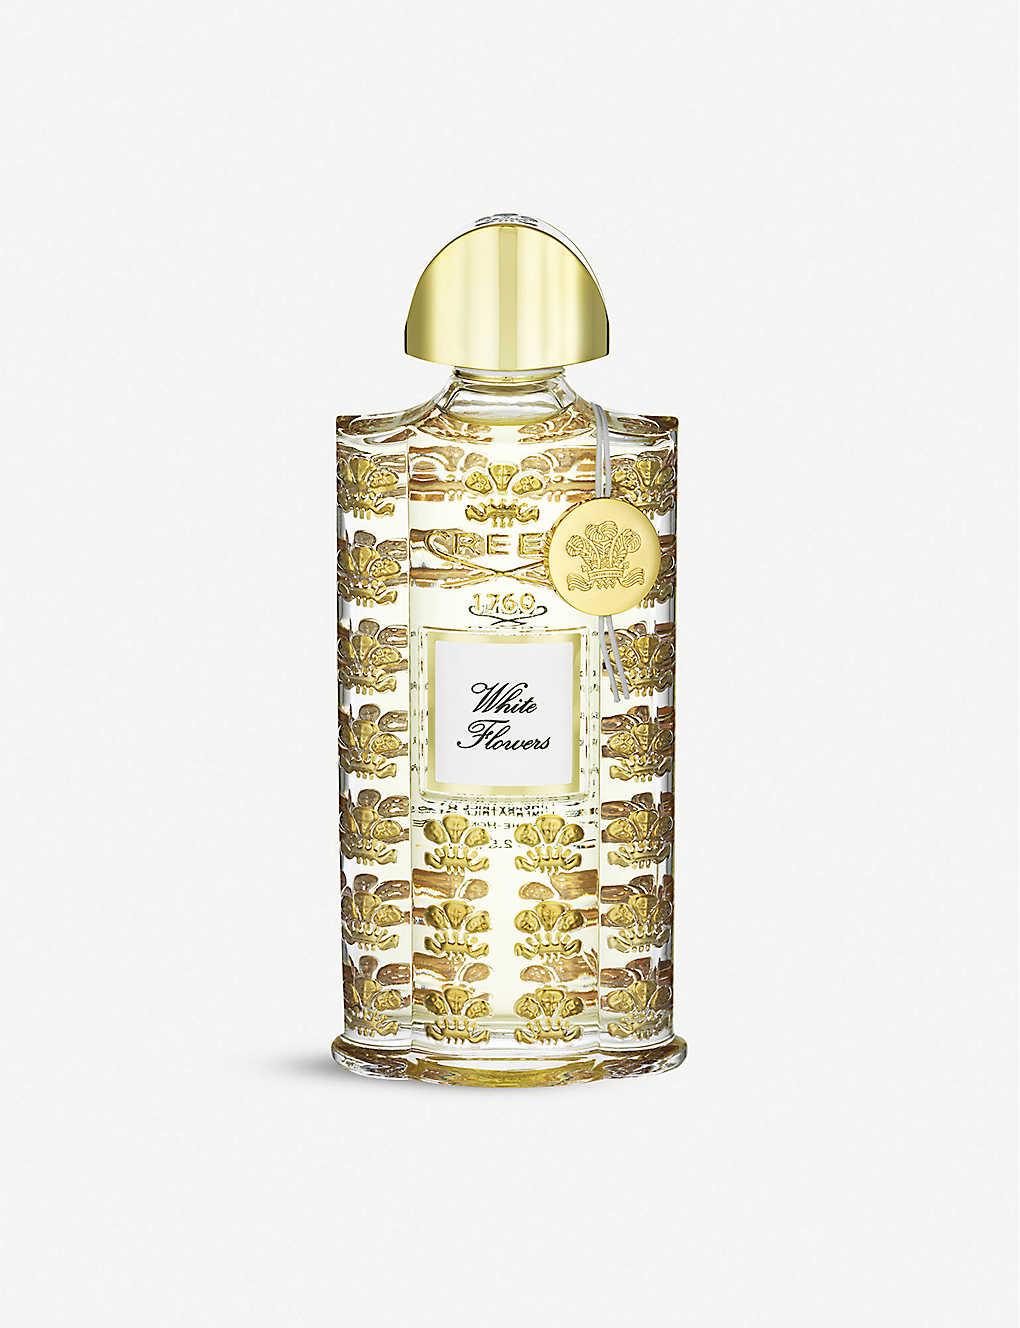 Creed White Flowers Eau De Parfum 75ml Selfridgescom